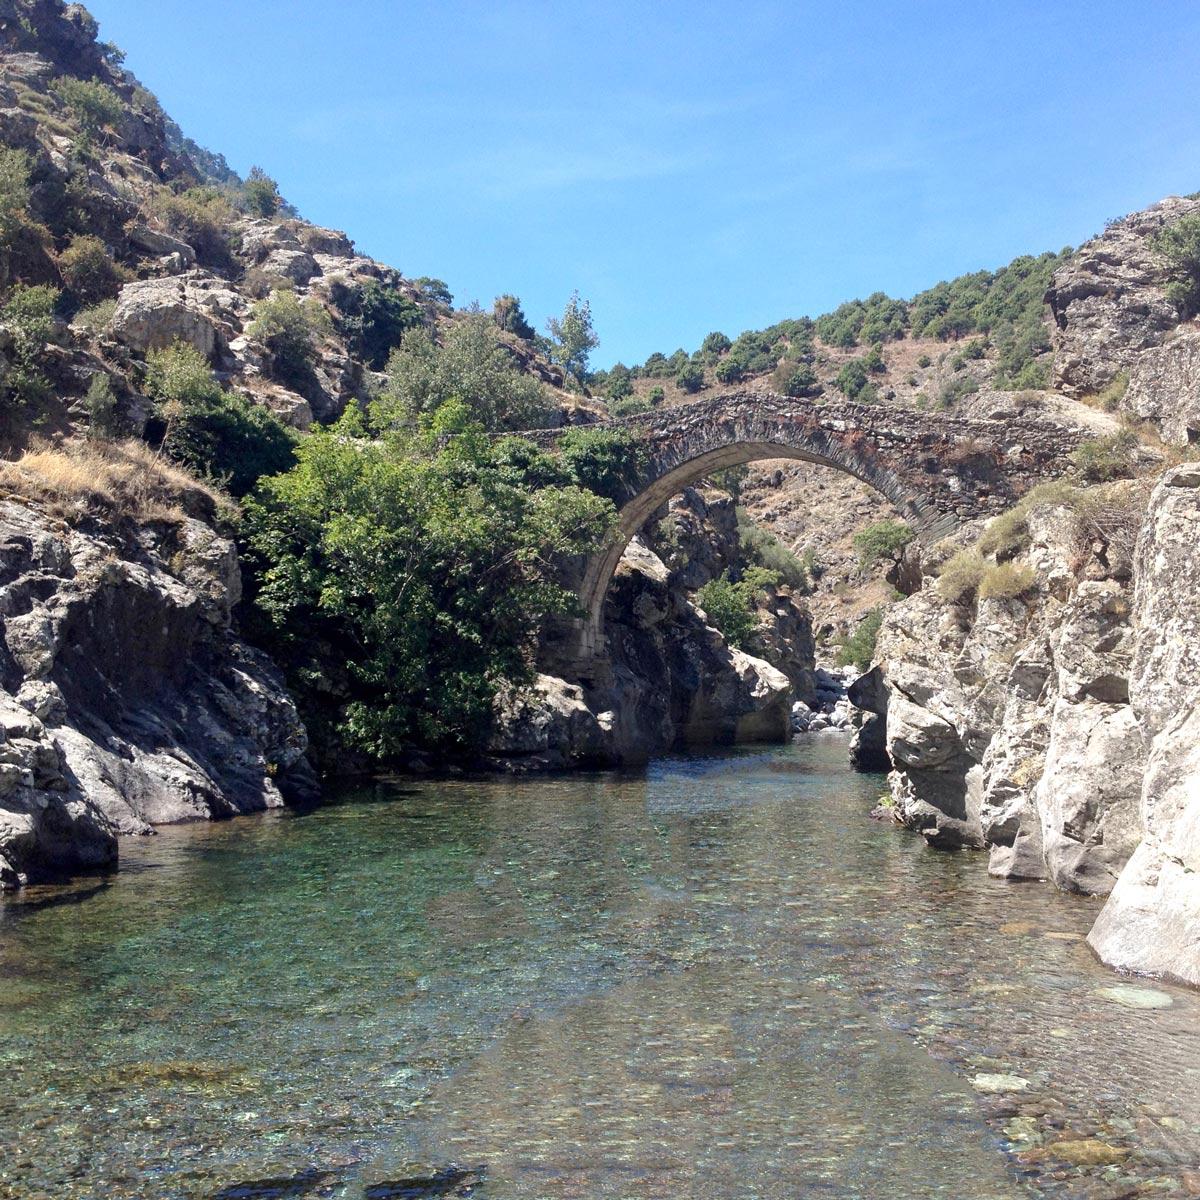 Gumpenwandern in Korsika